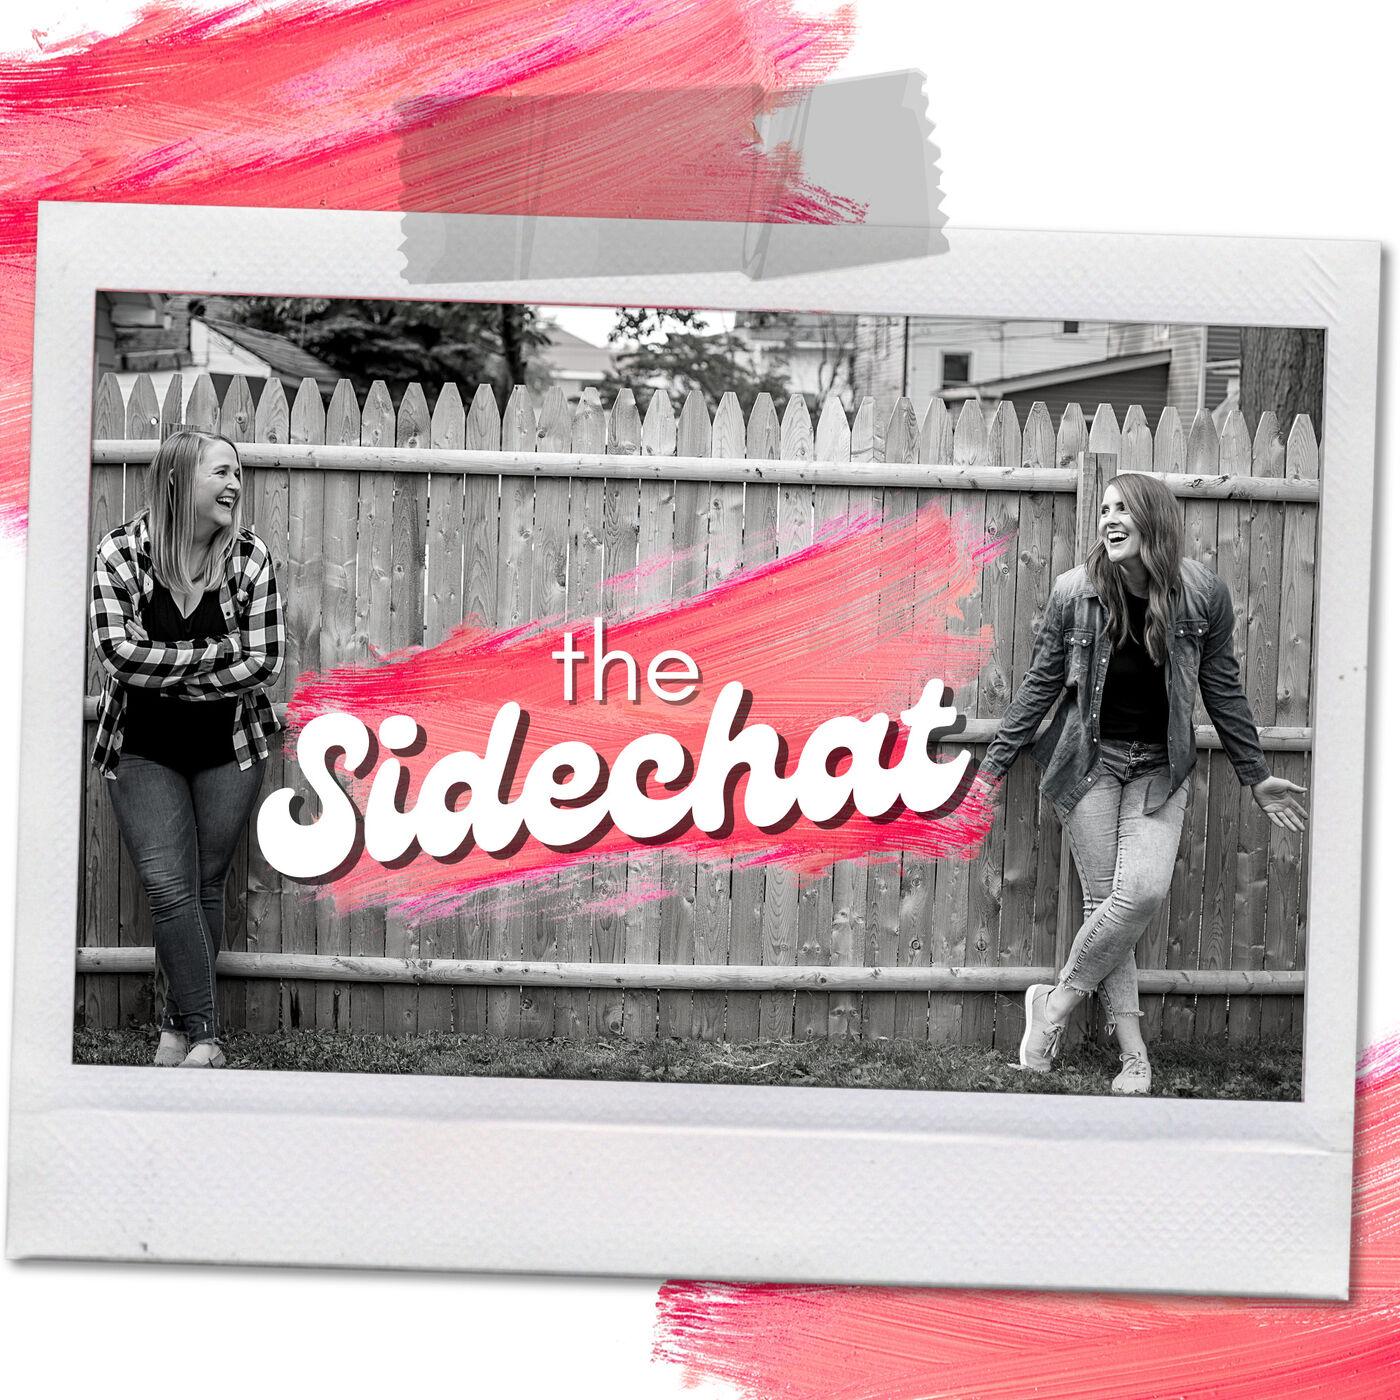 The Sidechat